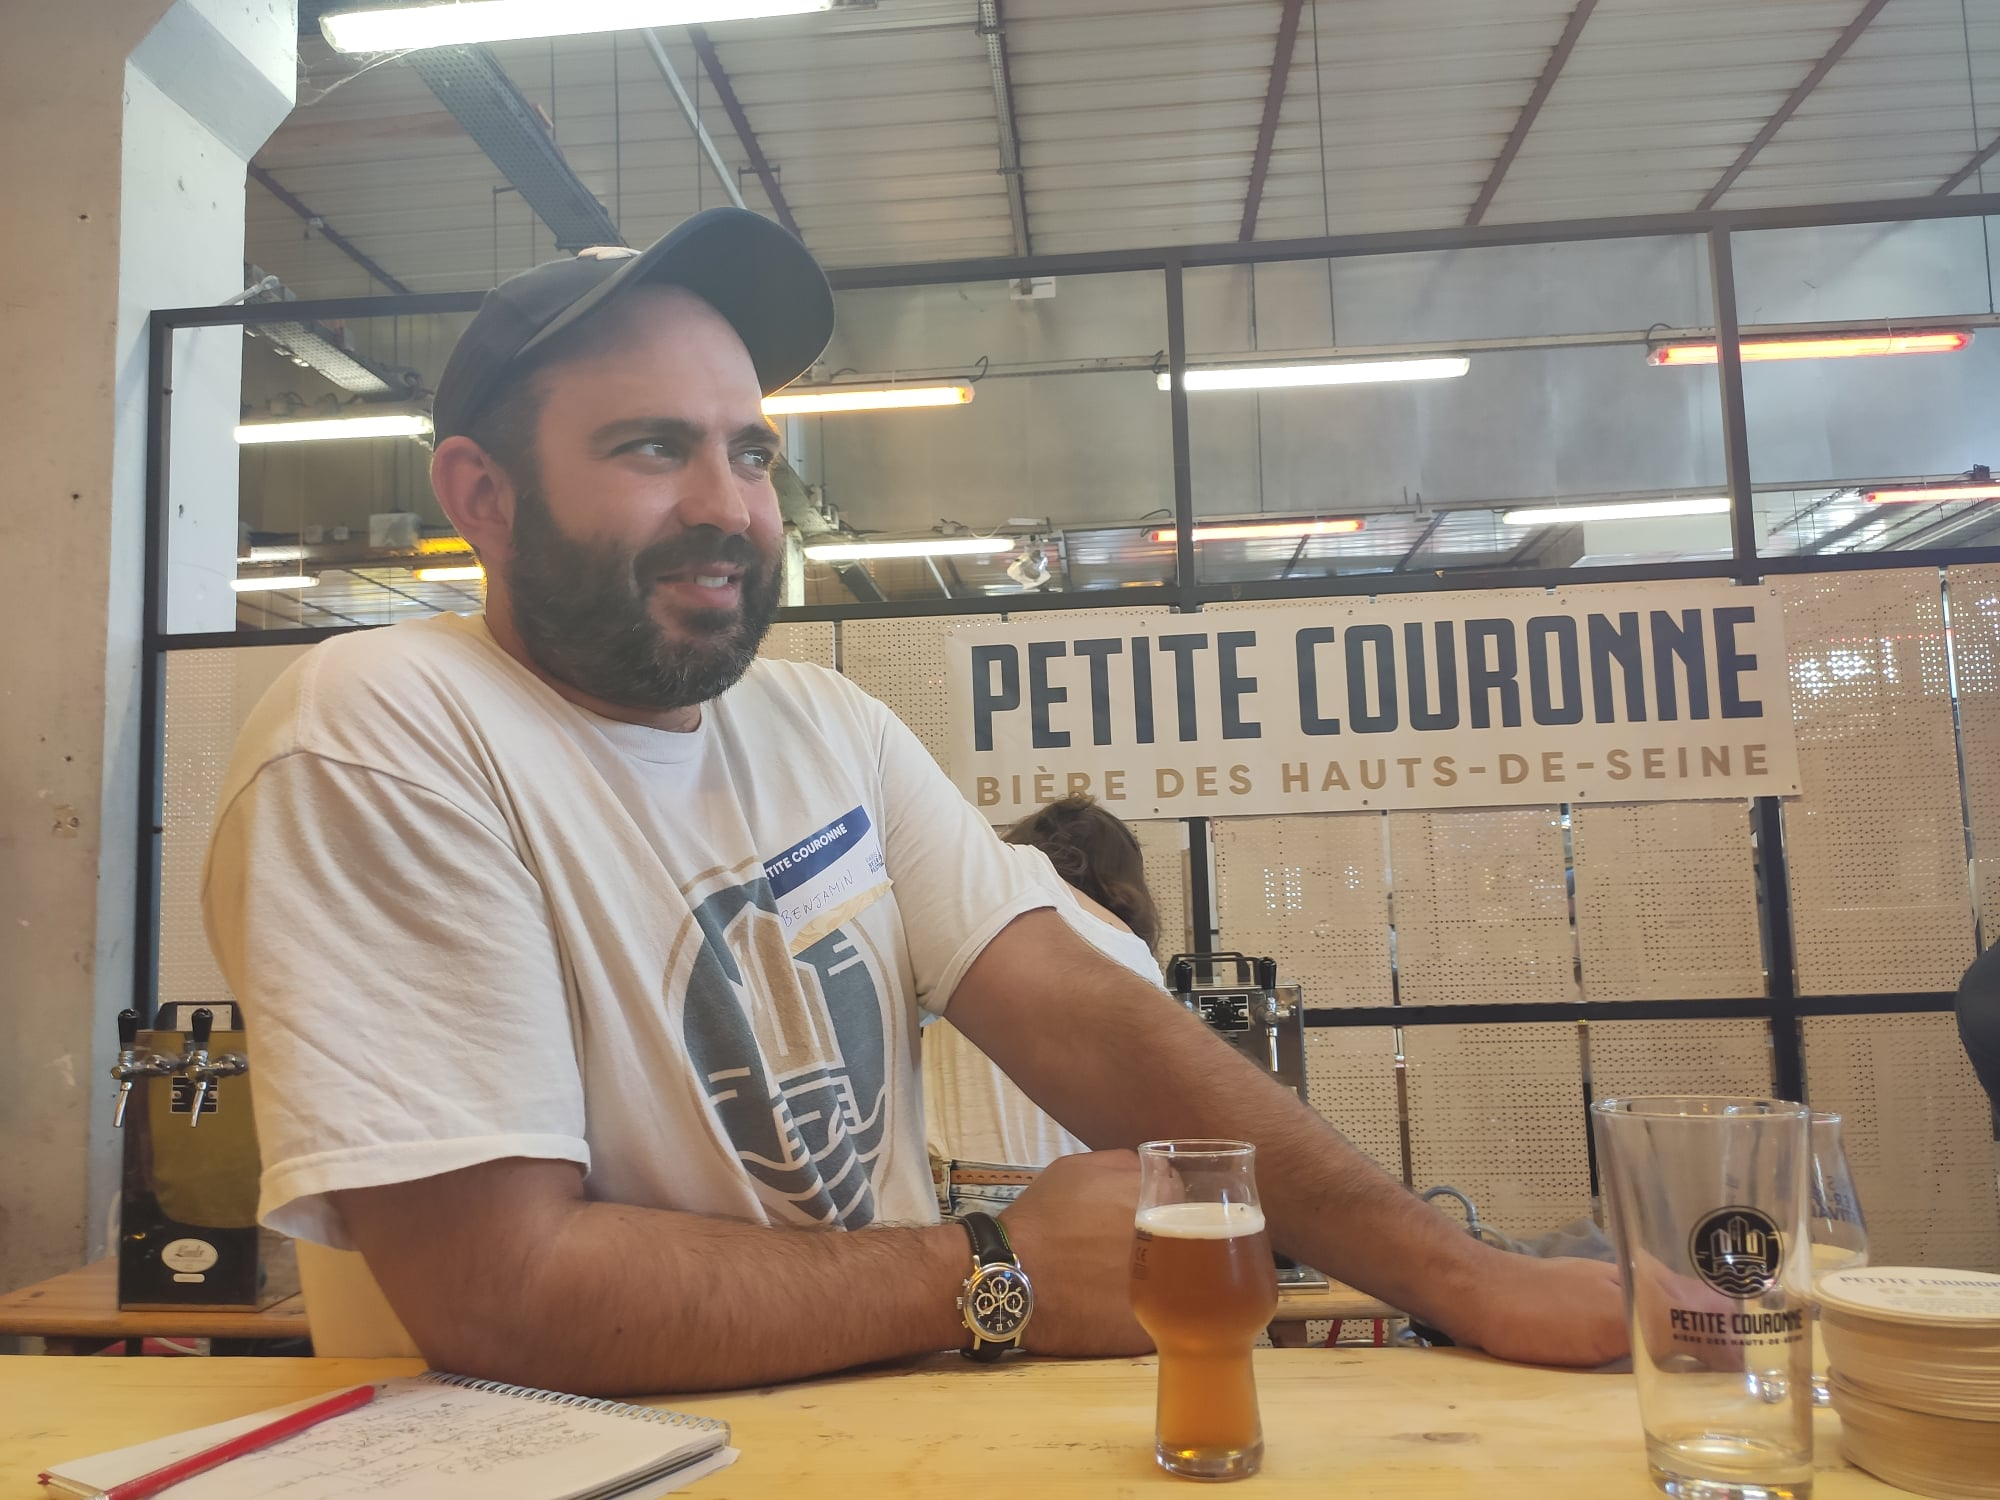 Paris Beer Festival - Benjamin Gauffre (Petite Couronne)